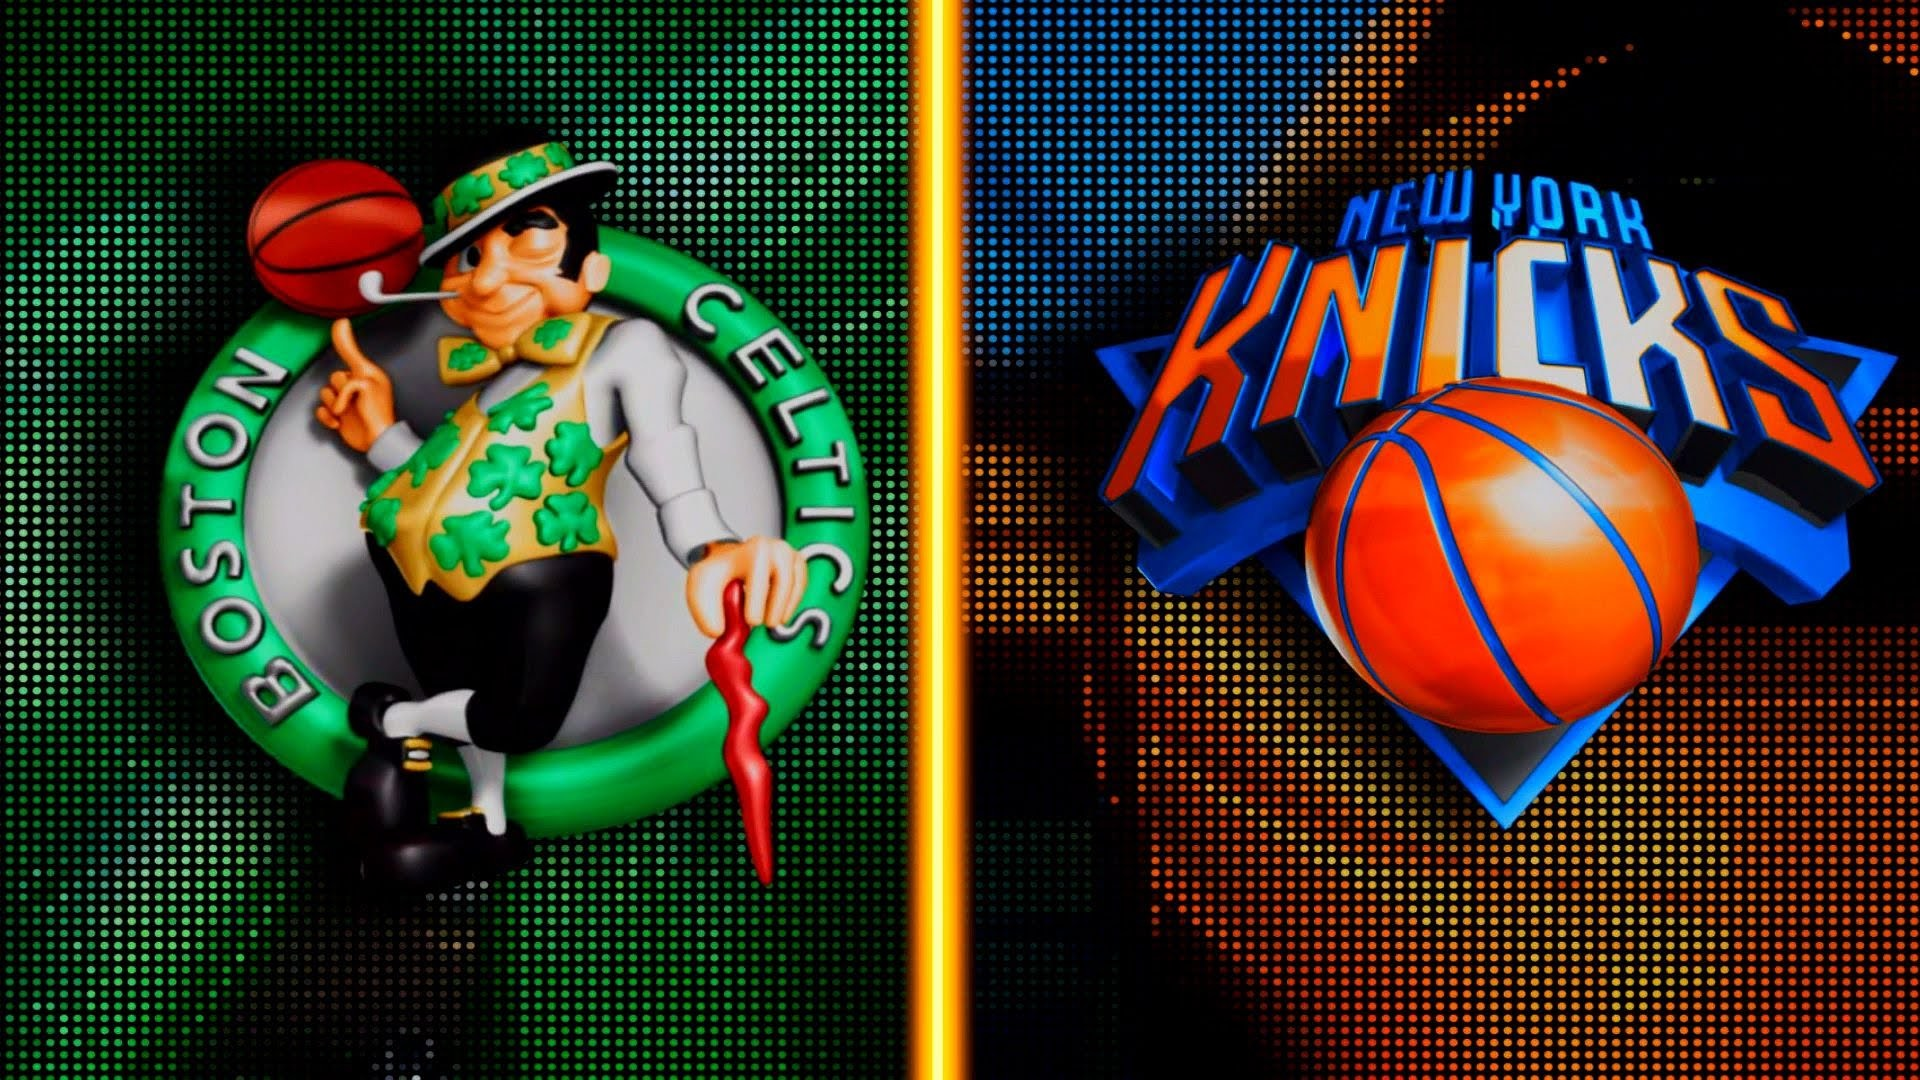 PS4: NBA 2K16 – Boston Celtics vs. New York Knicks [1080p 60 FPS] – YouTube